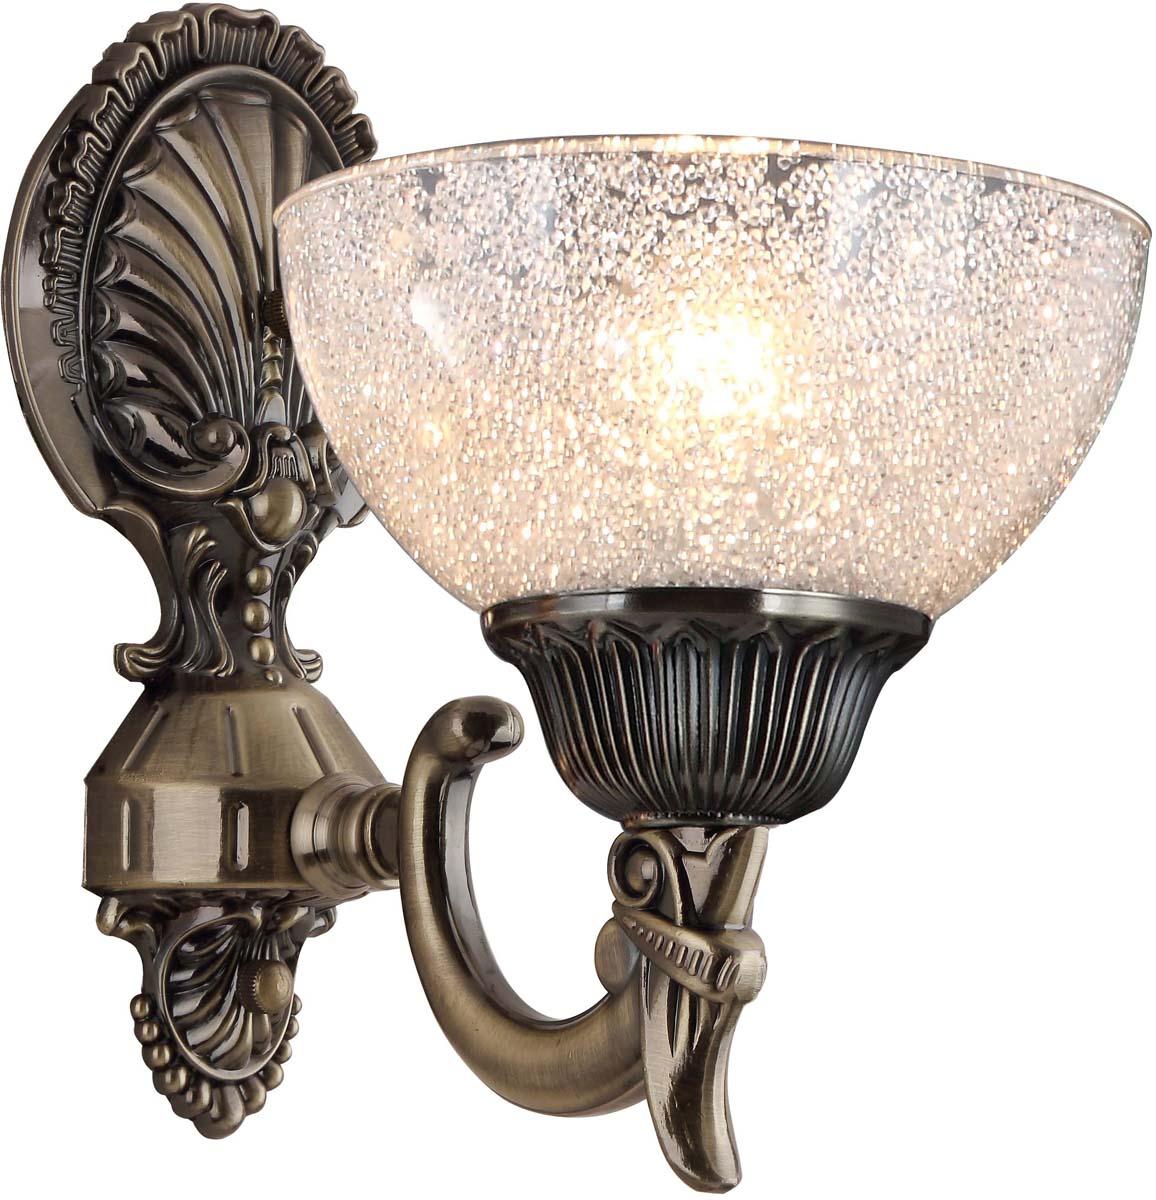 Бра Arte Lamp Fedelta, цвет: бронза, 1 х E27, 60 W. A5861AP-1ABA5861AP-1AB